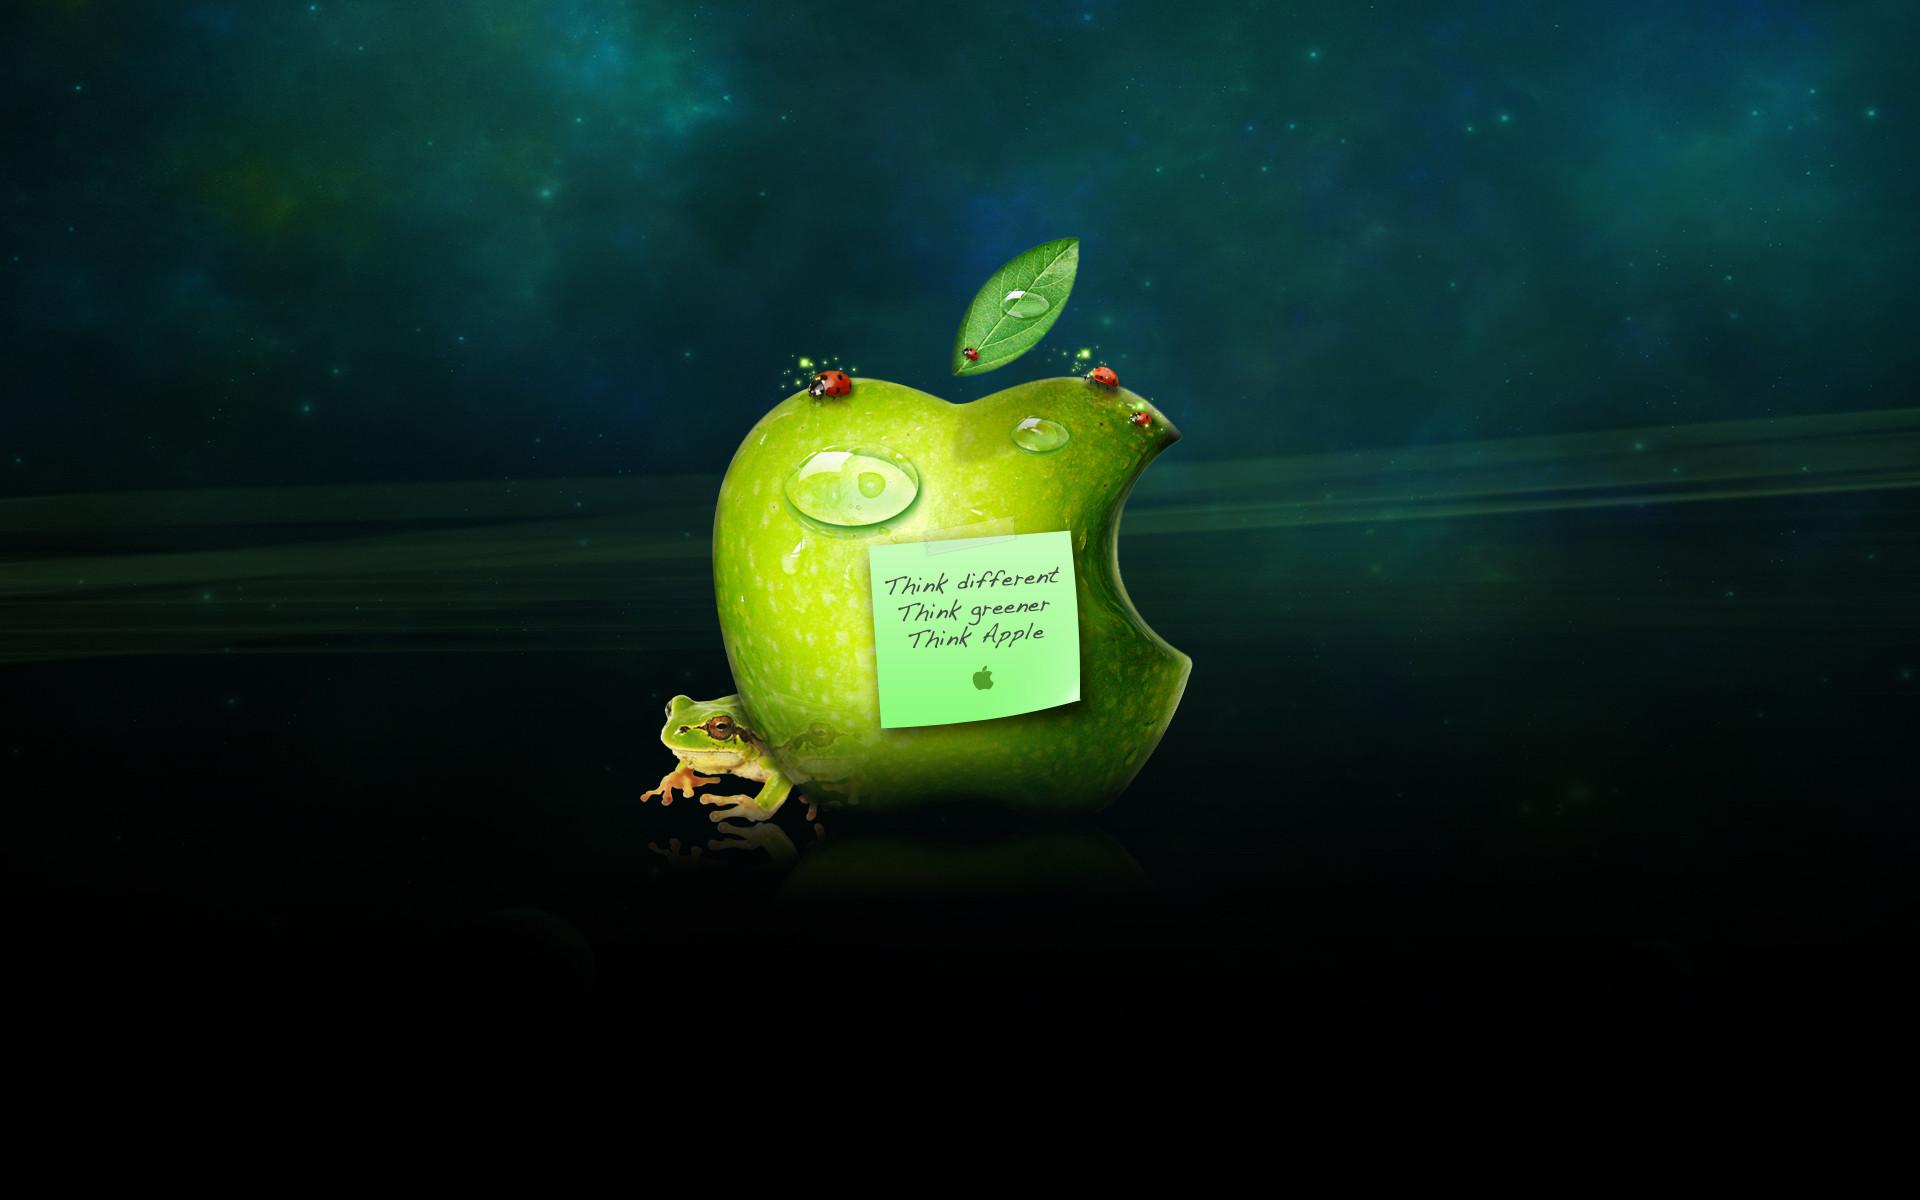 … Apple HD Wallpapers Apple Logo Desktop Backgrounds | Page 1